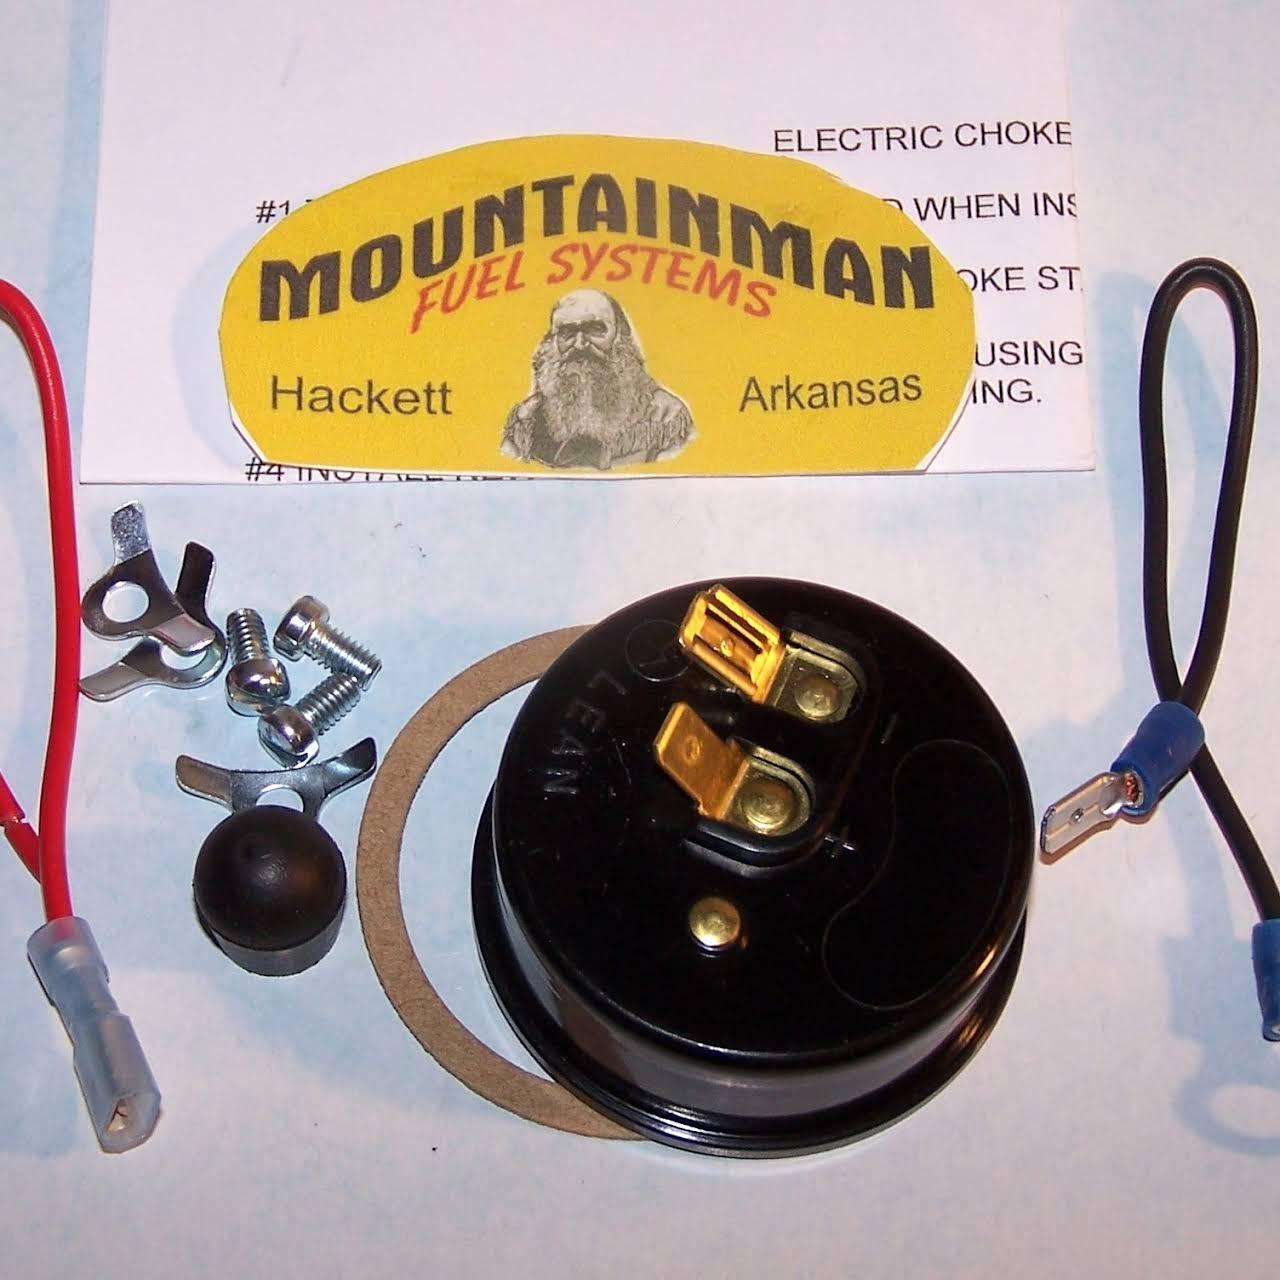 Mountain Man Fuel Systems - Carburetors, Rebuilding Service